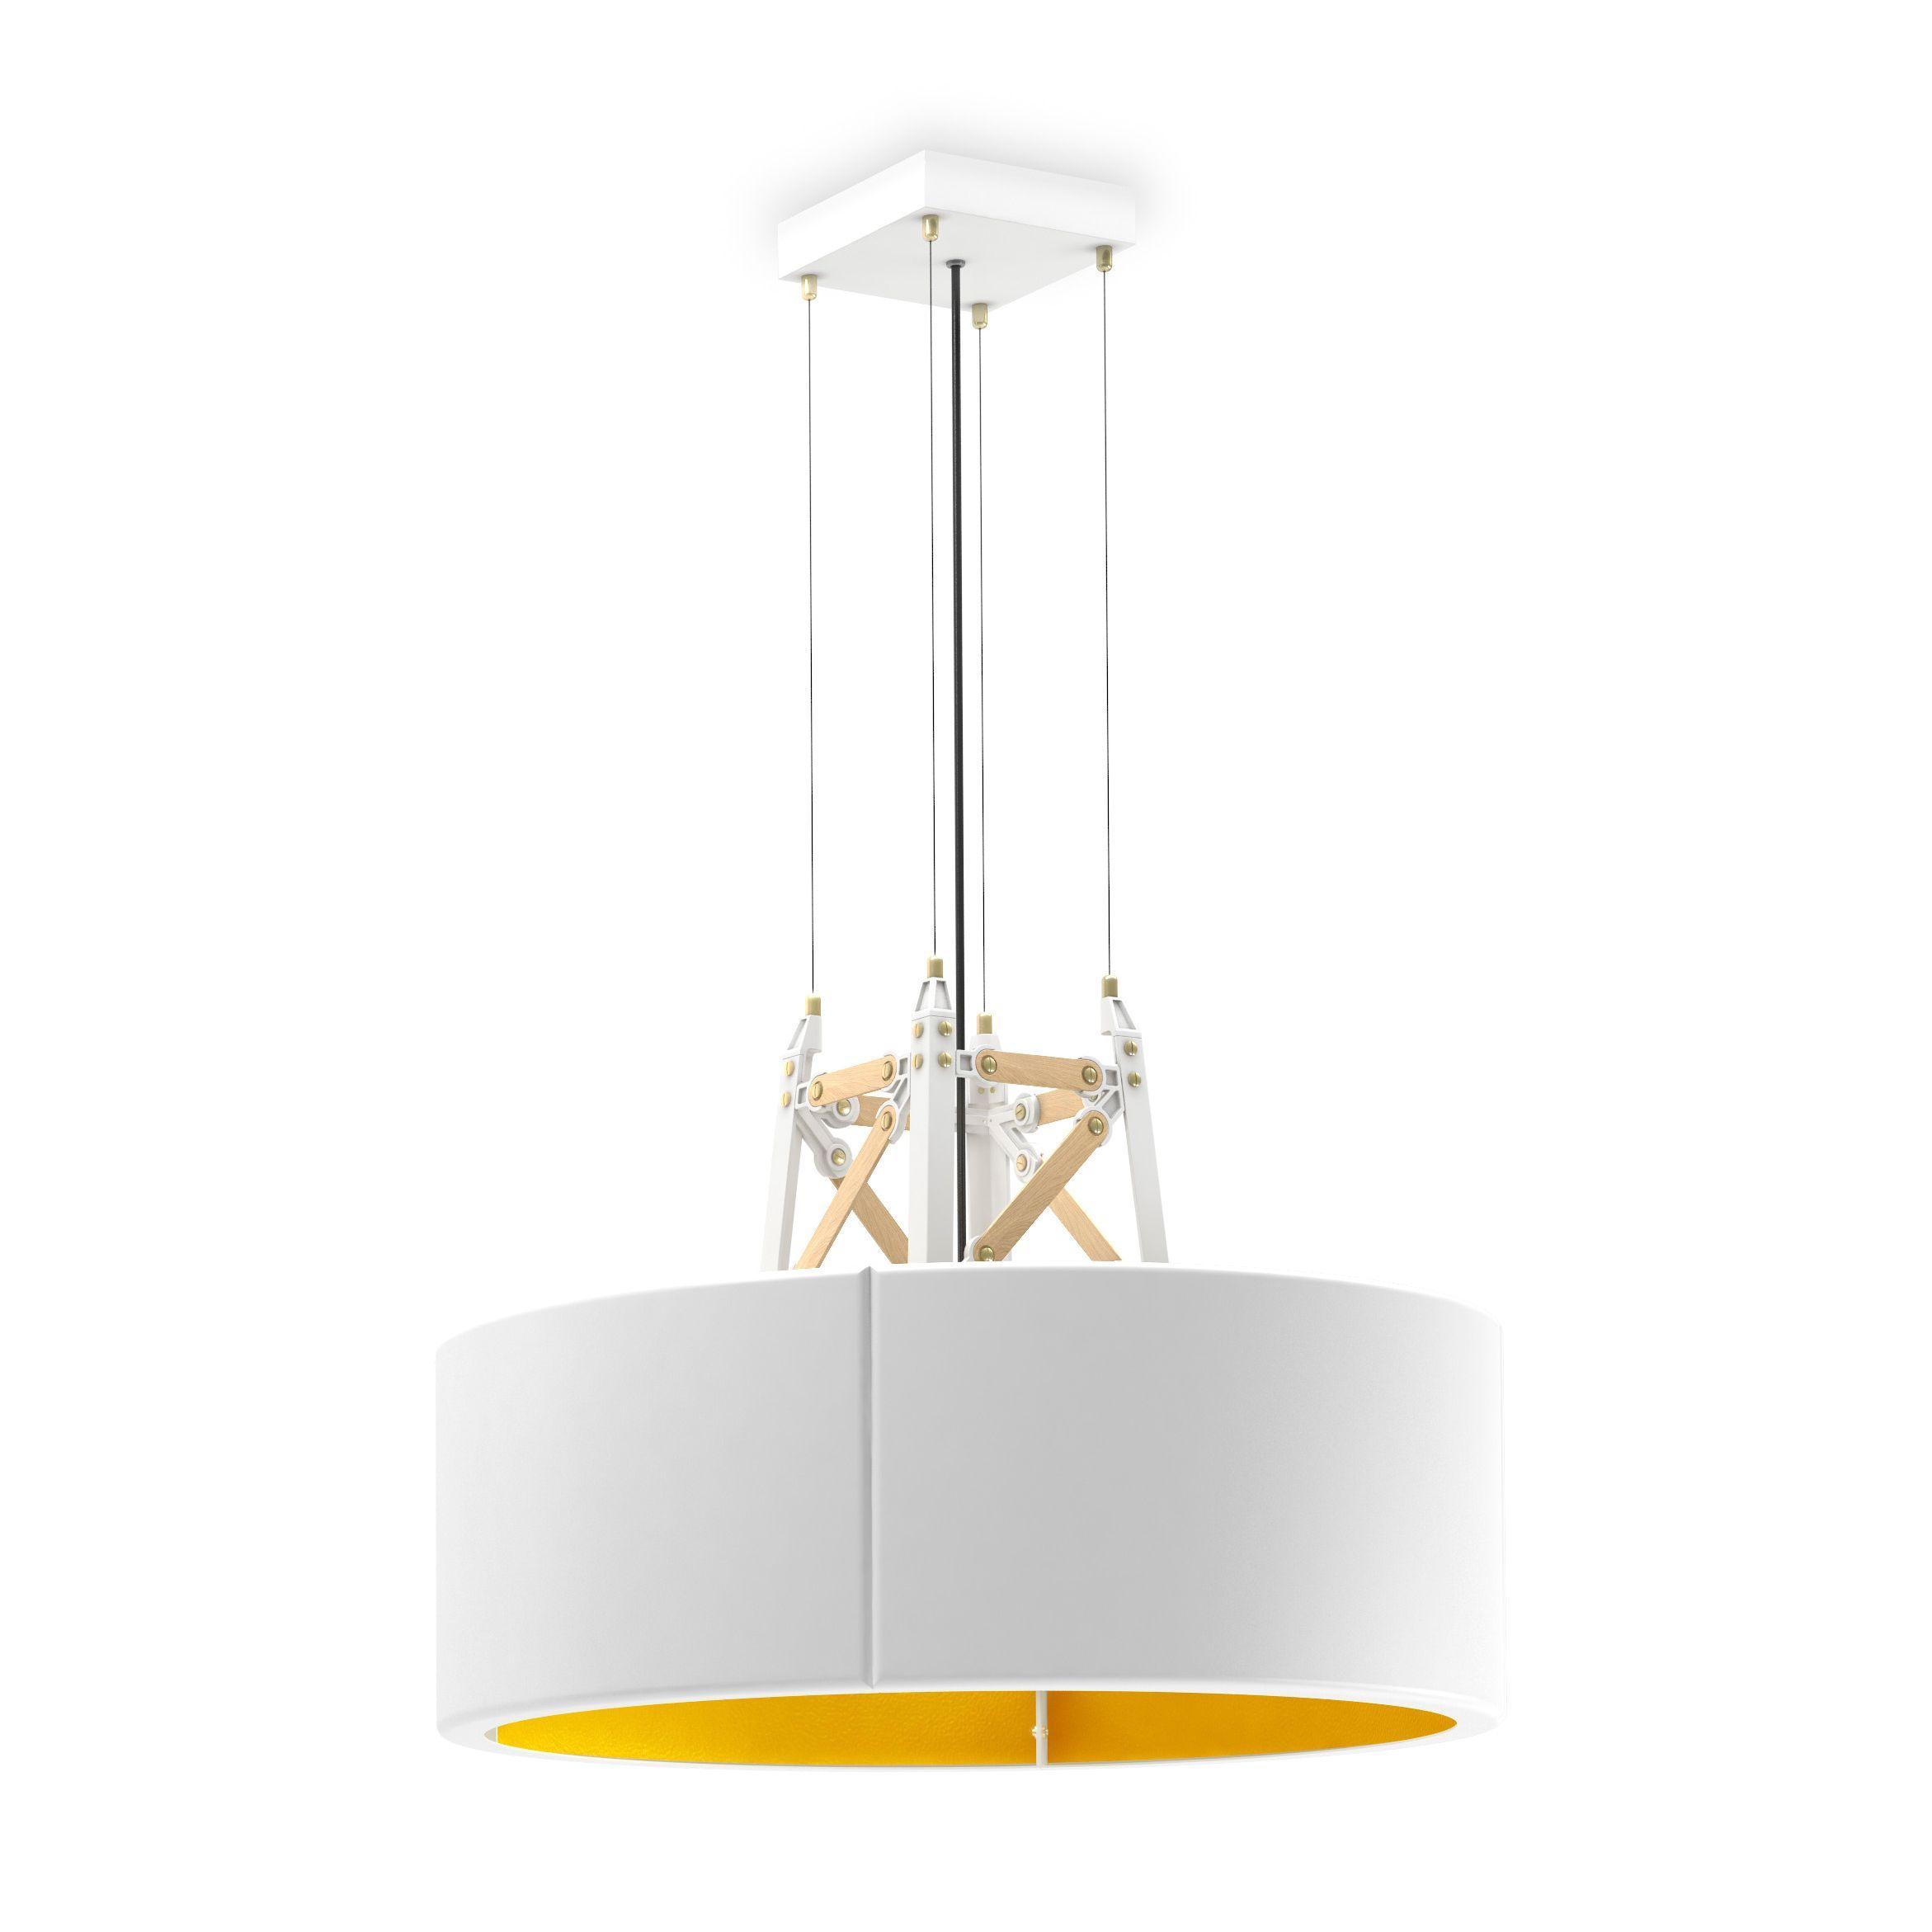 small sma lighting wood moooi table light construction lights white lamp